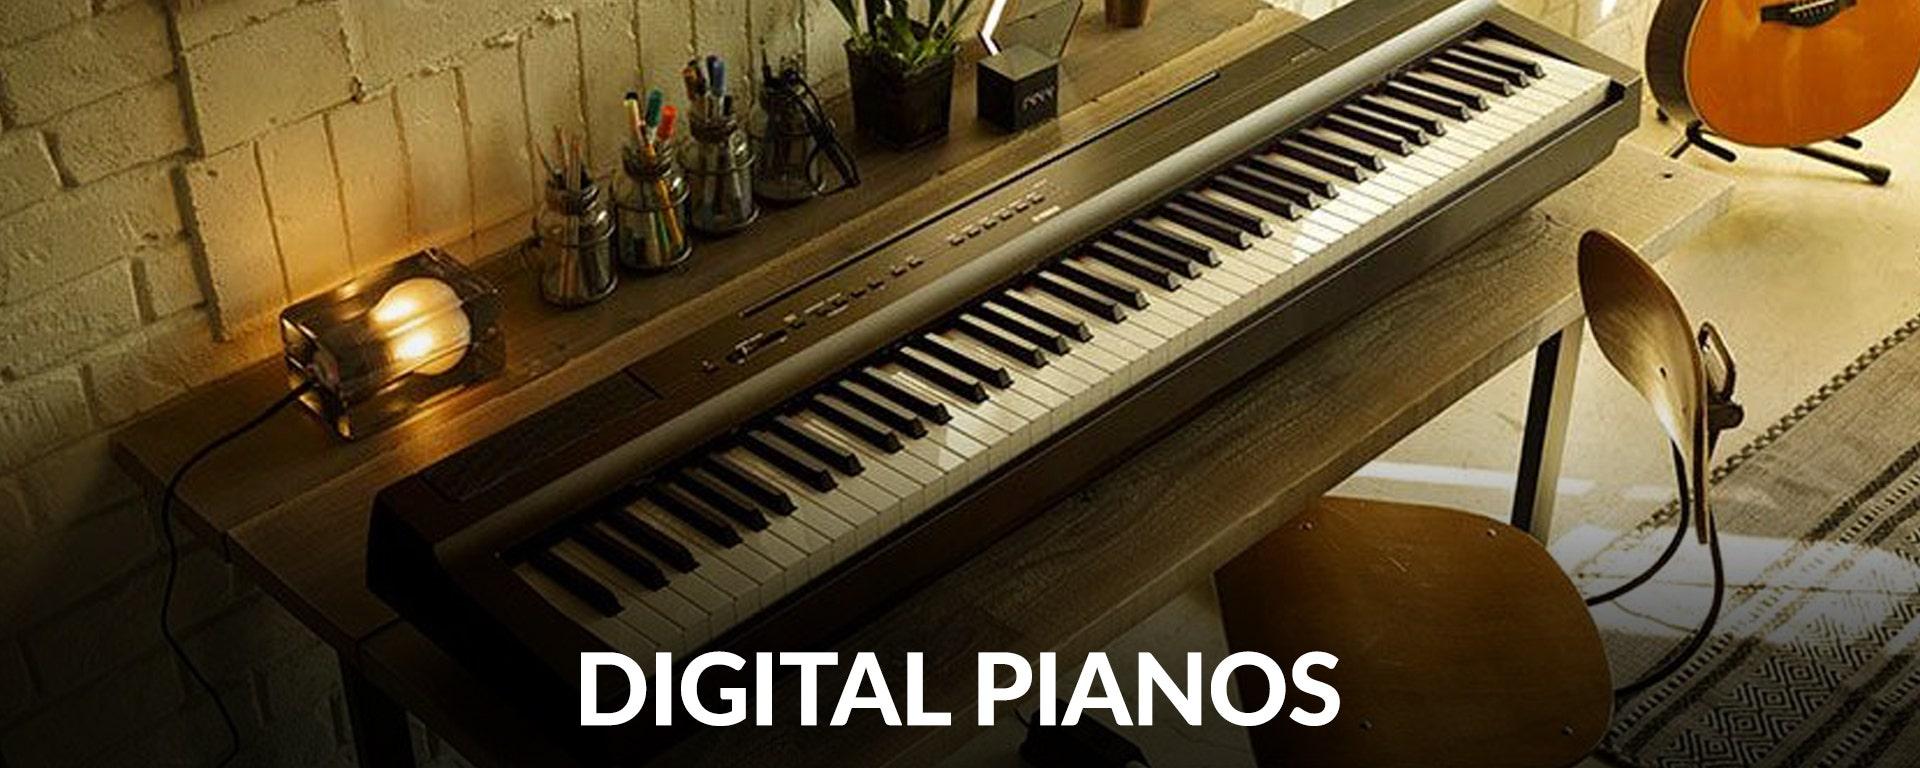 Digital Pianos at SamAsh.com